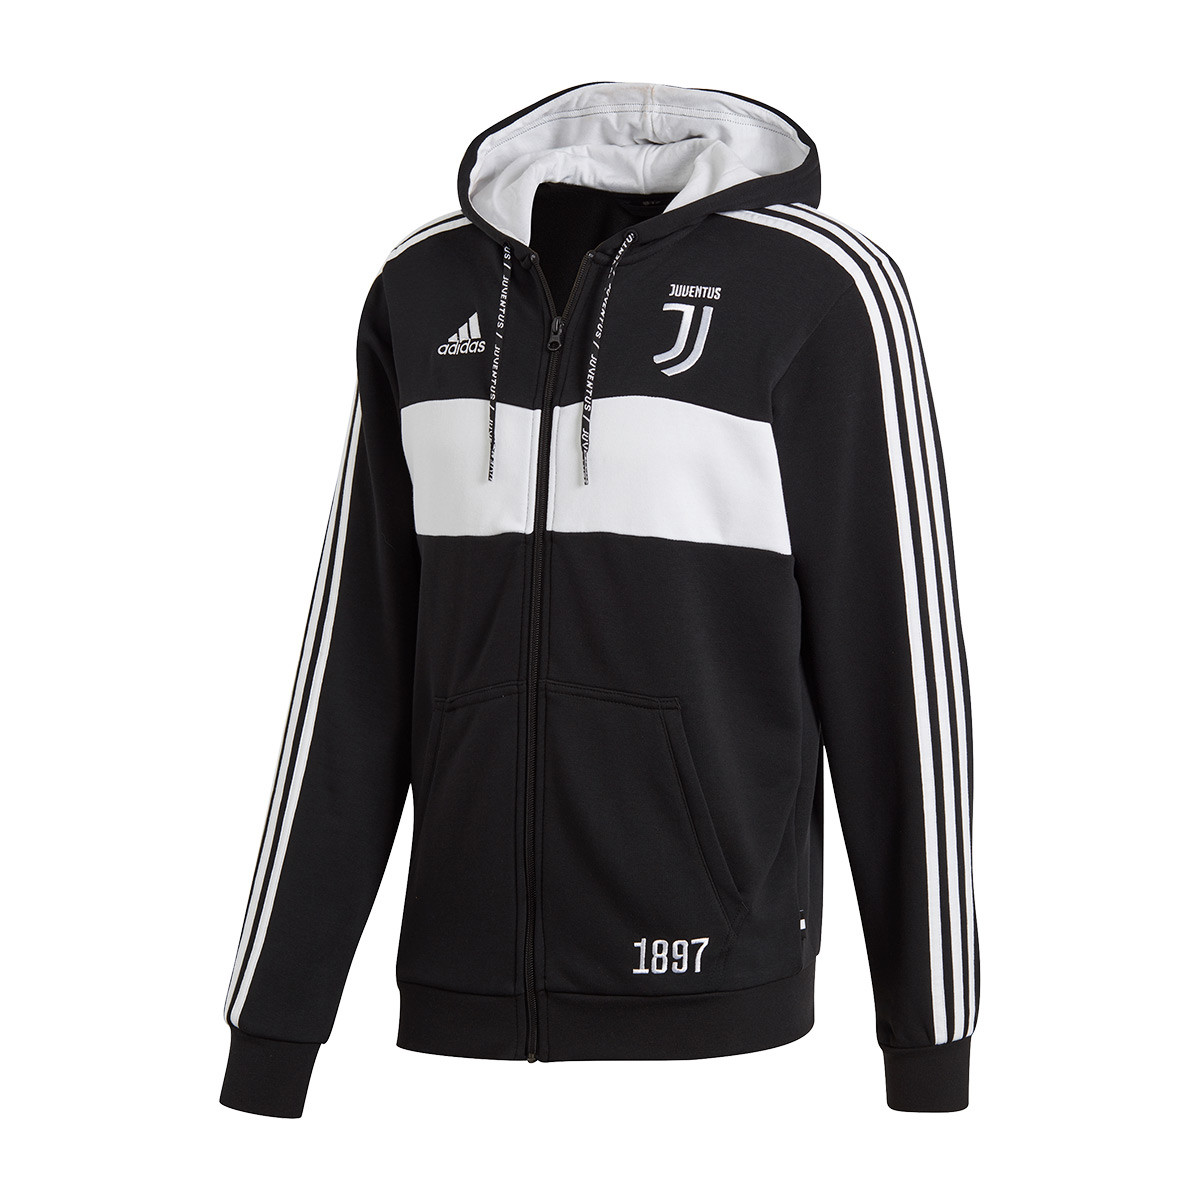 Giacca adidas Juventus FZ Hoody 2019 2020